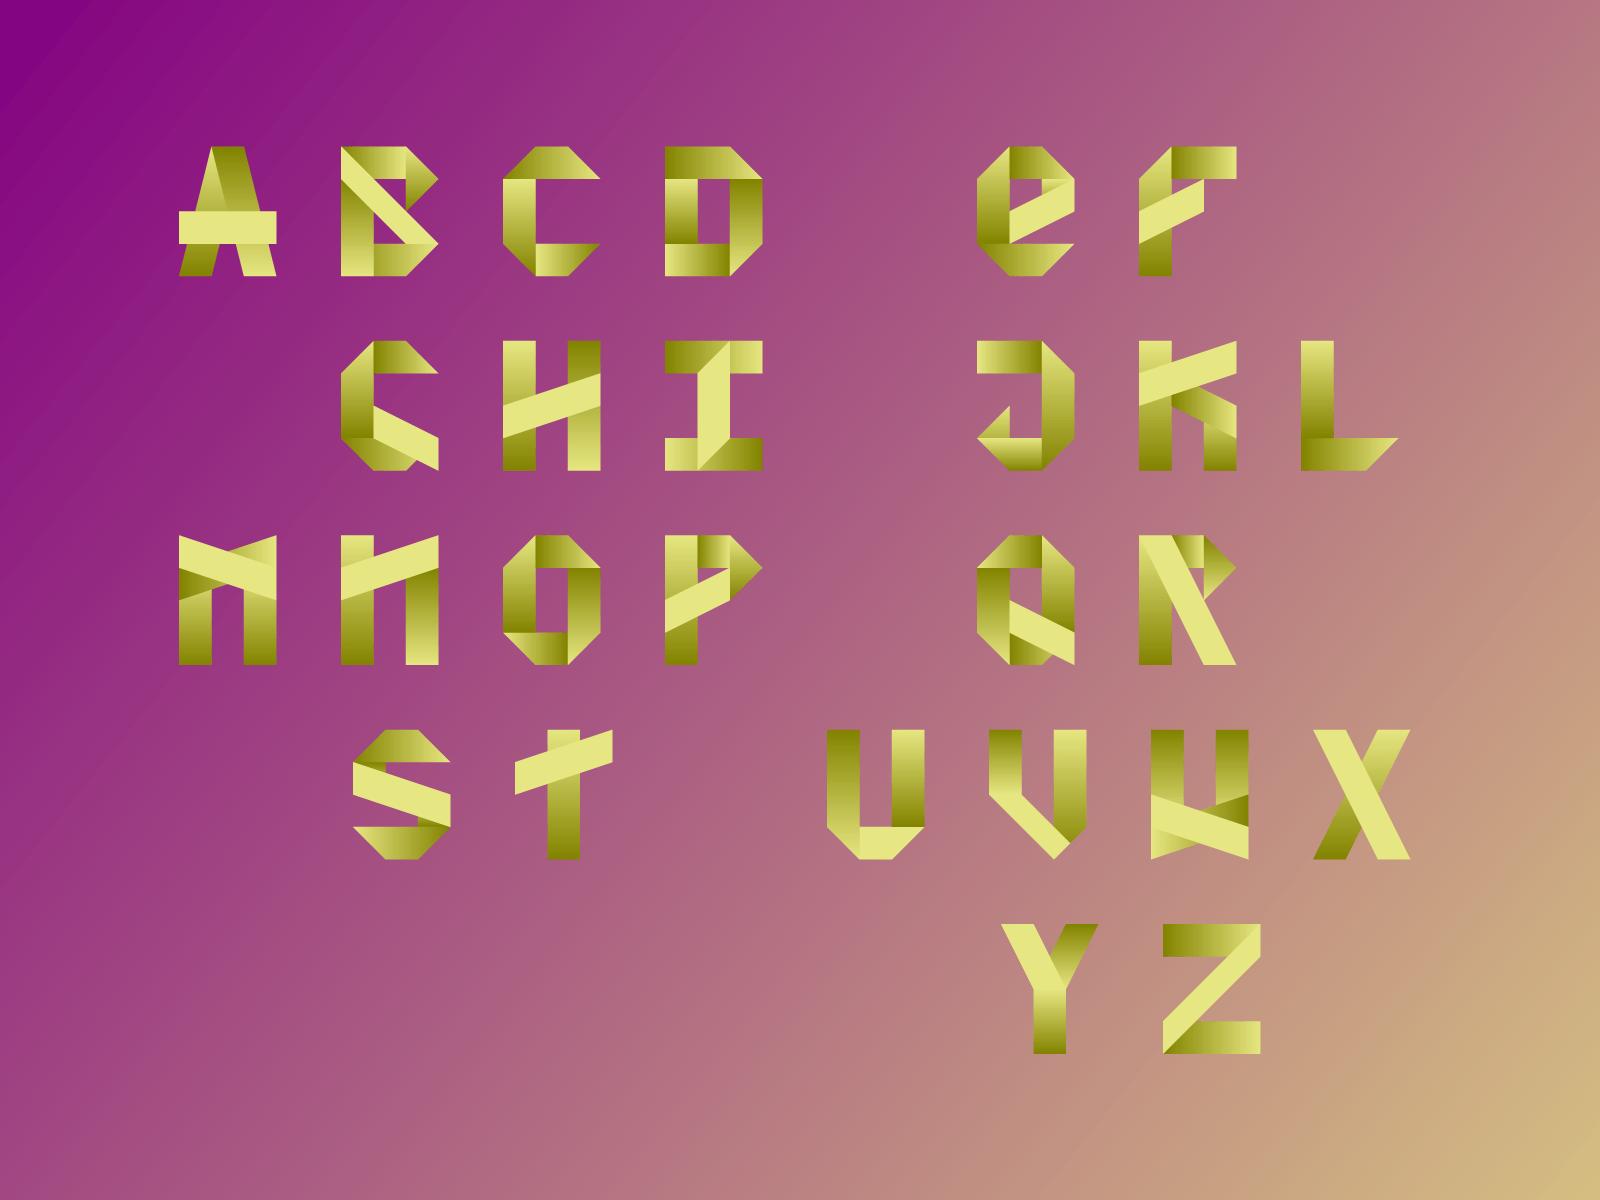 0c54cb0668c8aa86bf626215235908b4